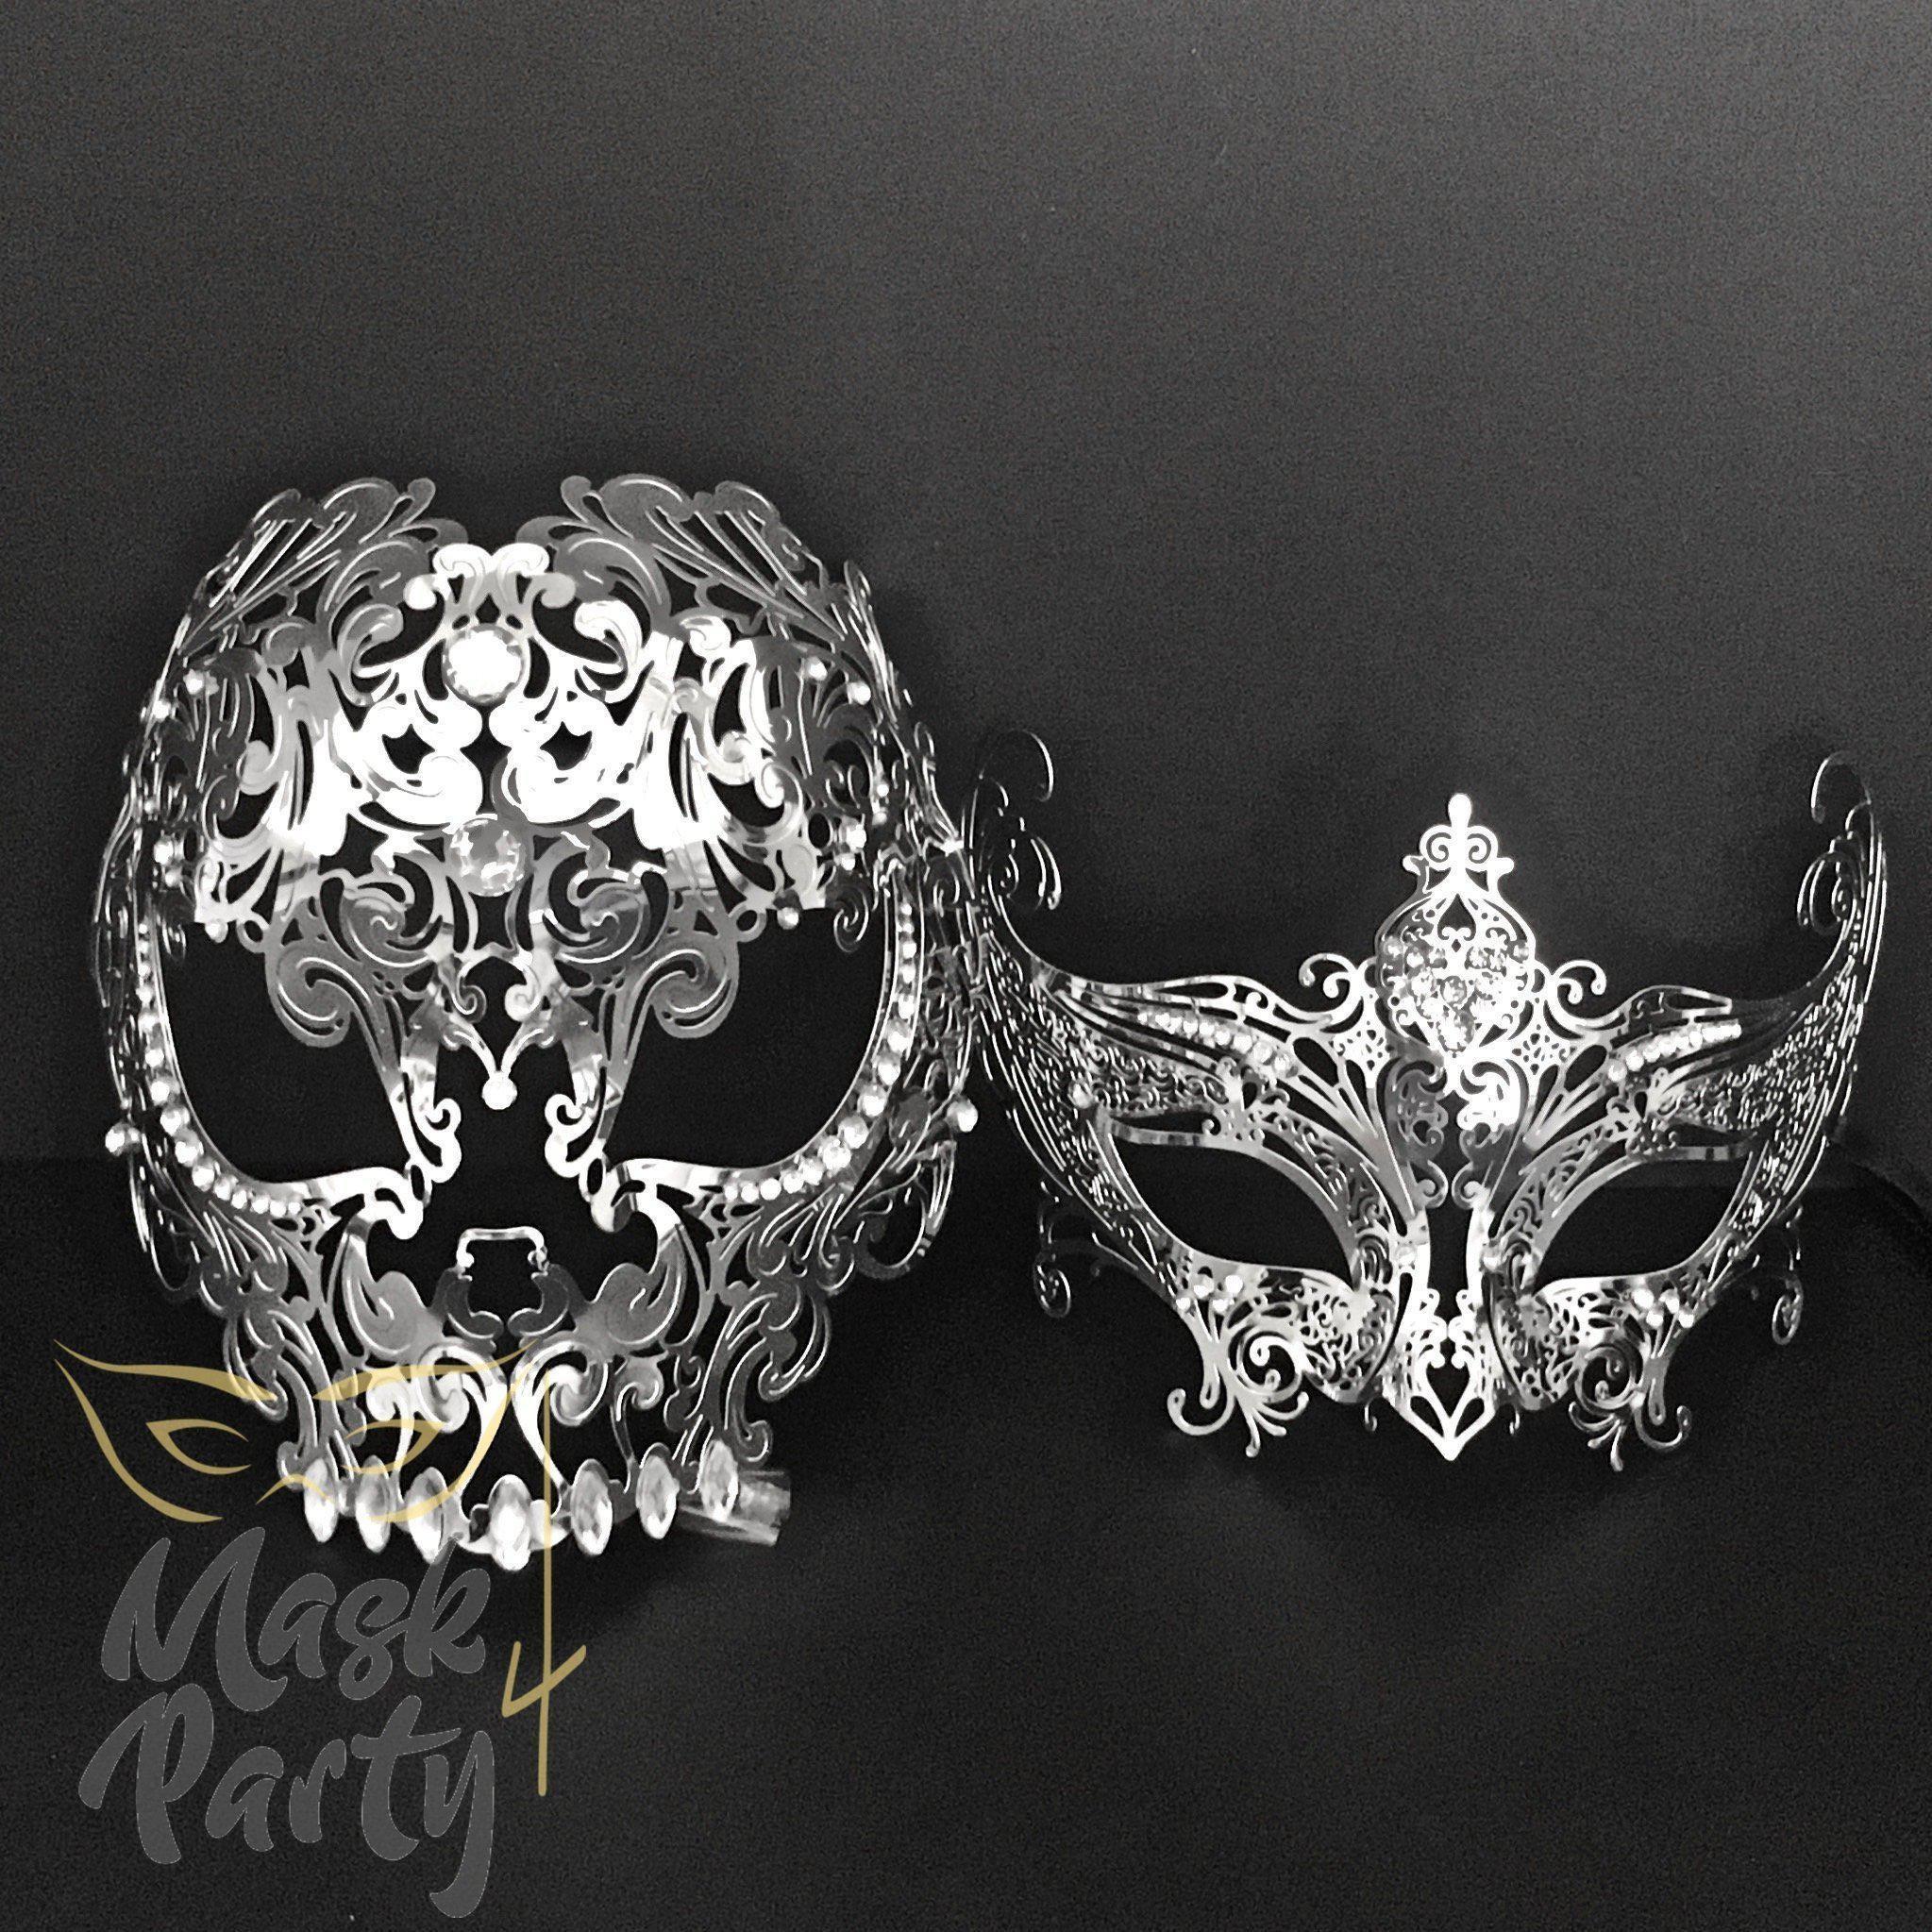 Vampire Queen Silver Metal Venetian Masquerade Mask with Clear Rhinestones